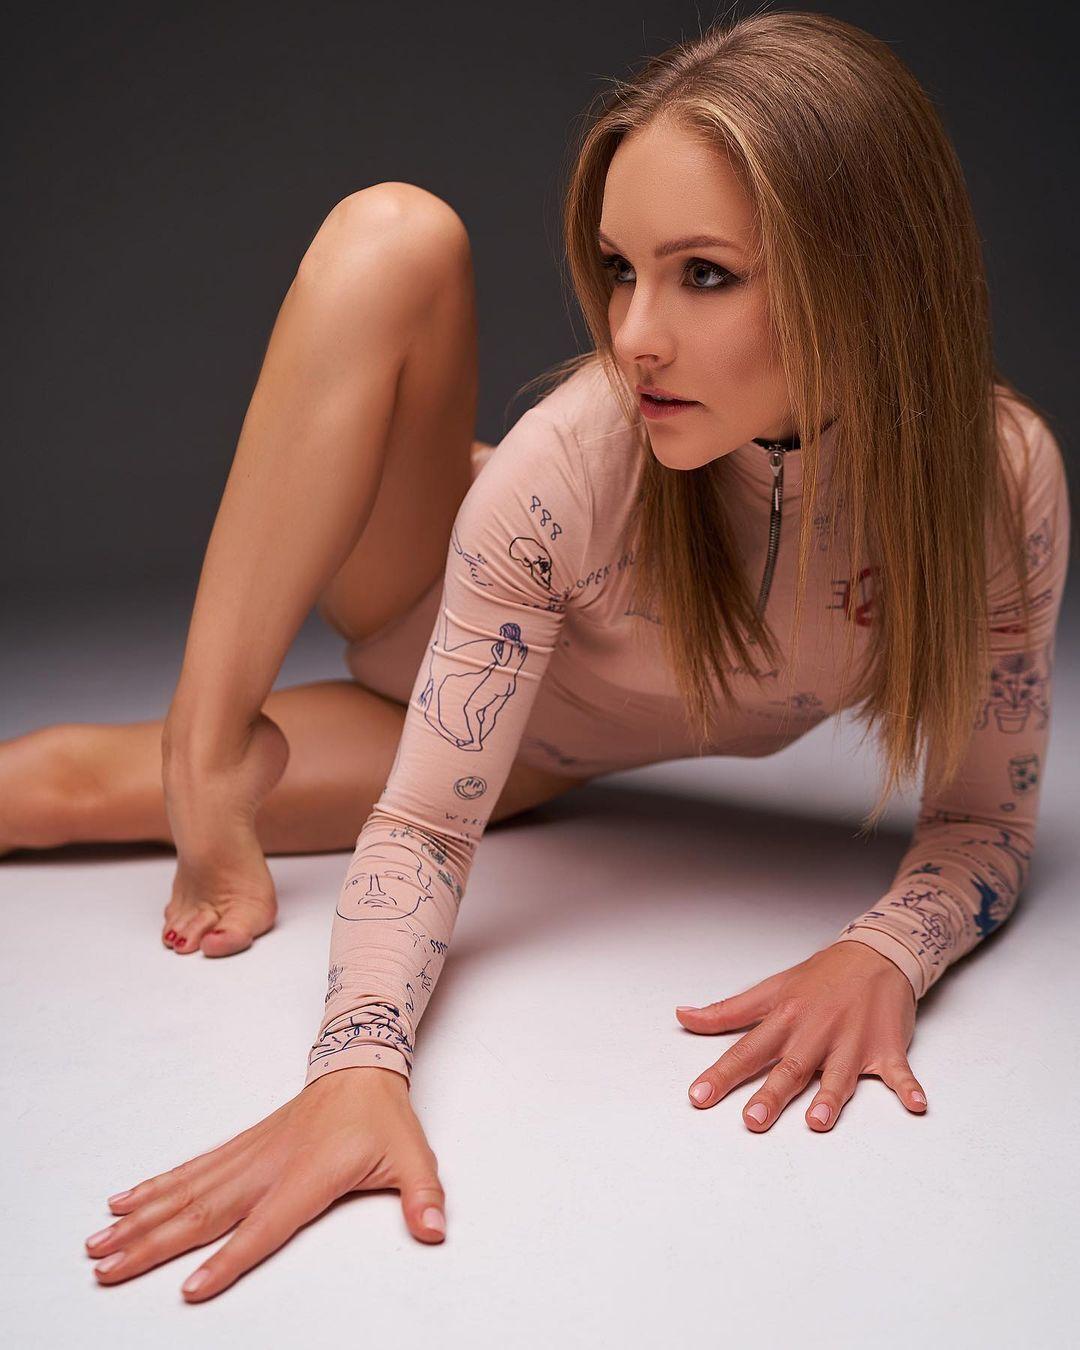 Алена Шоптенко показала поклонникам стройную фигуру